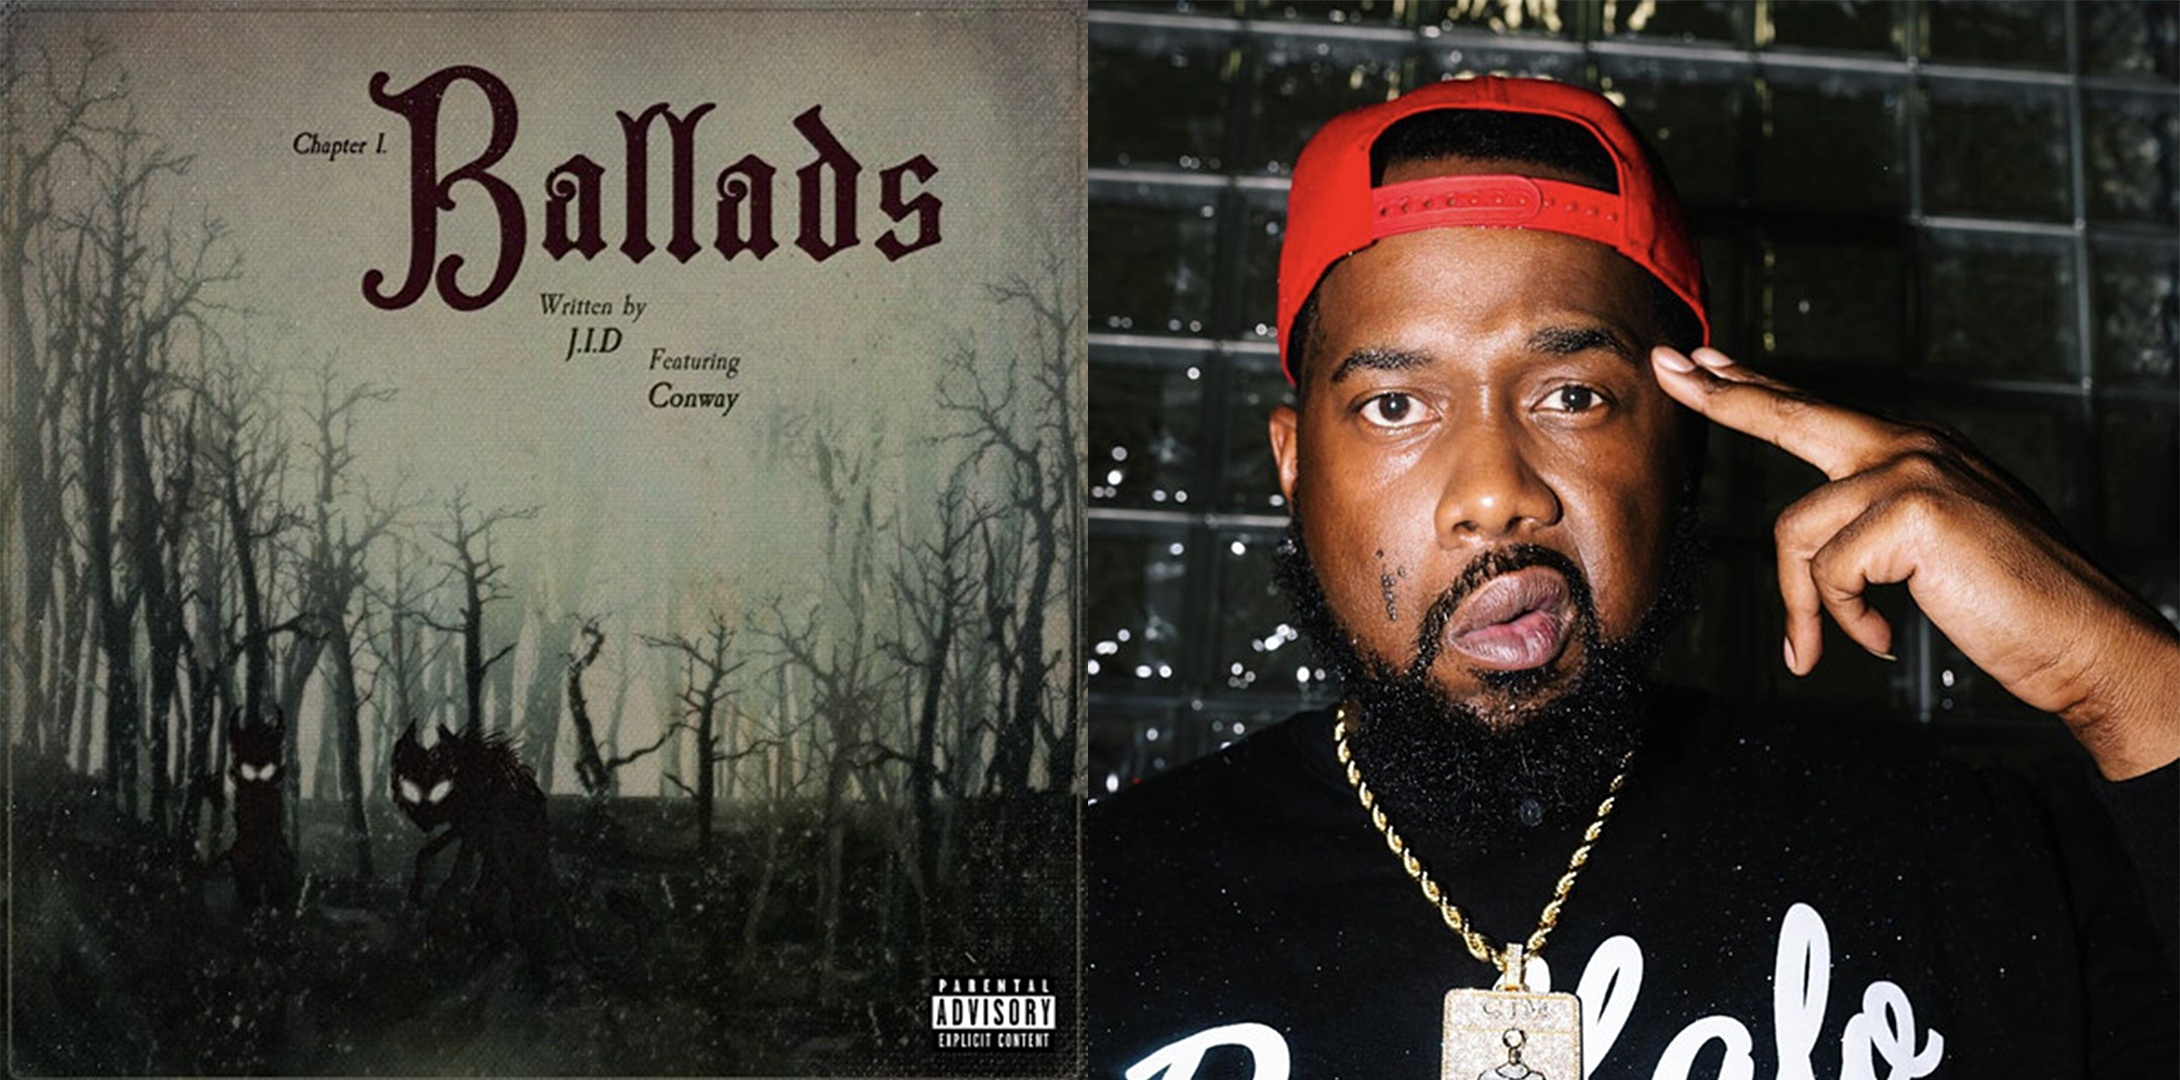 jid-ballads-conway-the-machine